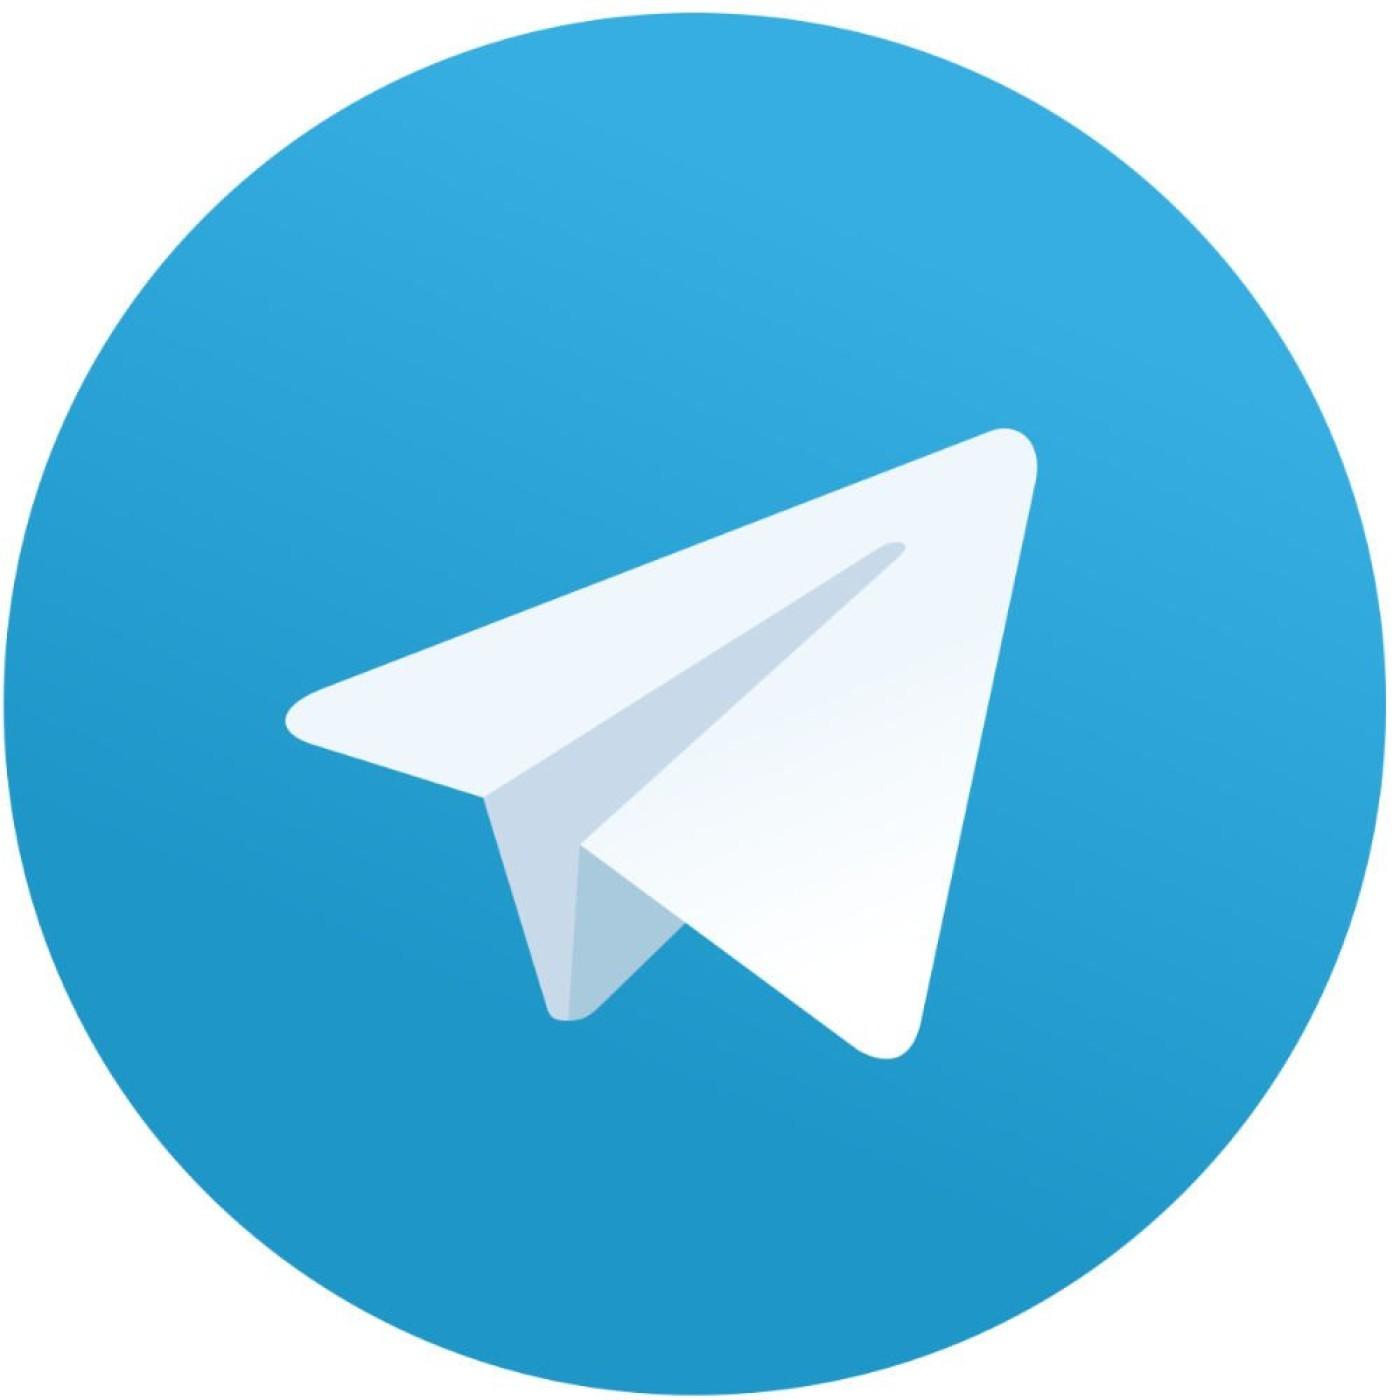 WhatsApp perd des millions d'utlisateurs au profit de Telegram et Signal - 13 01 2021 - StereoChic Radio